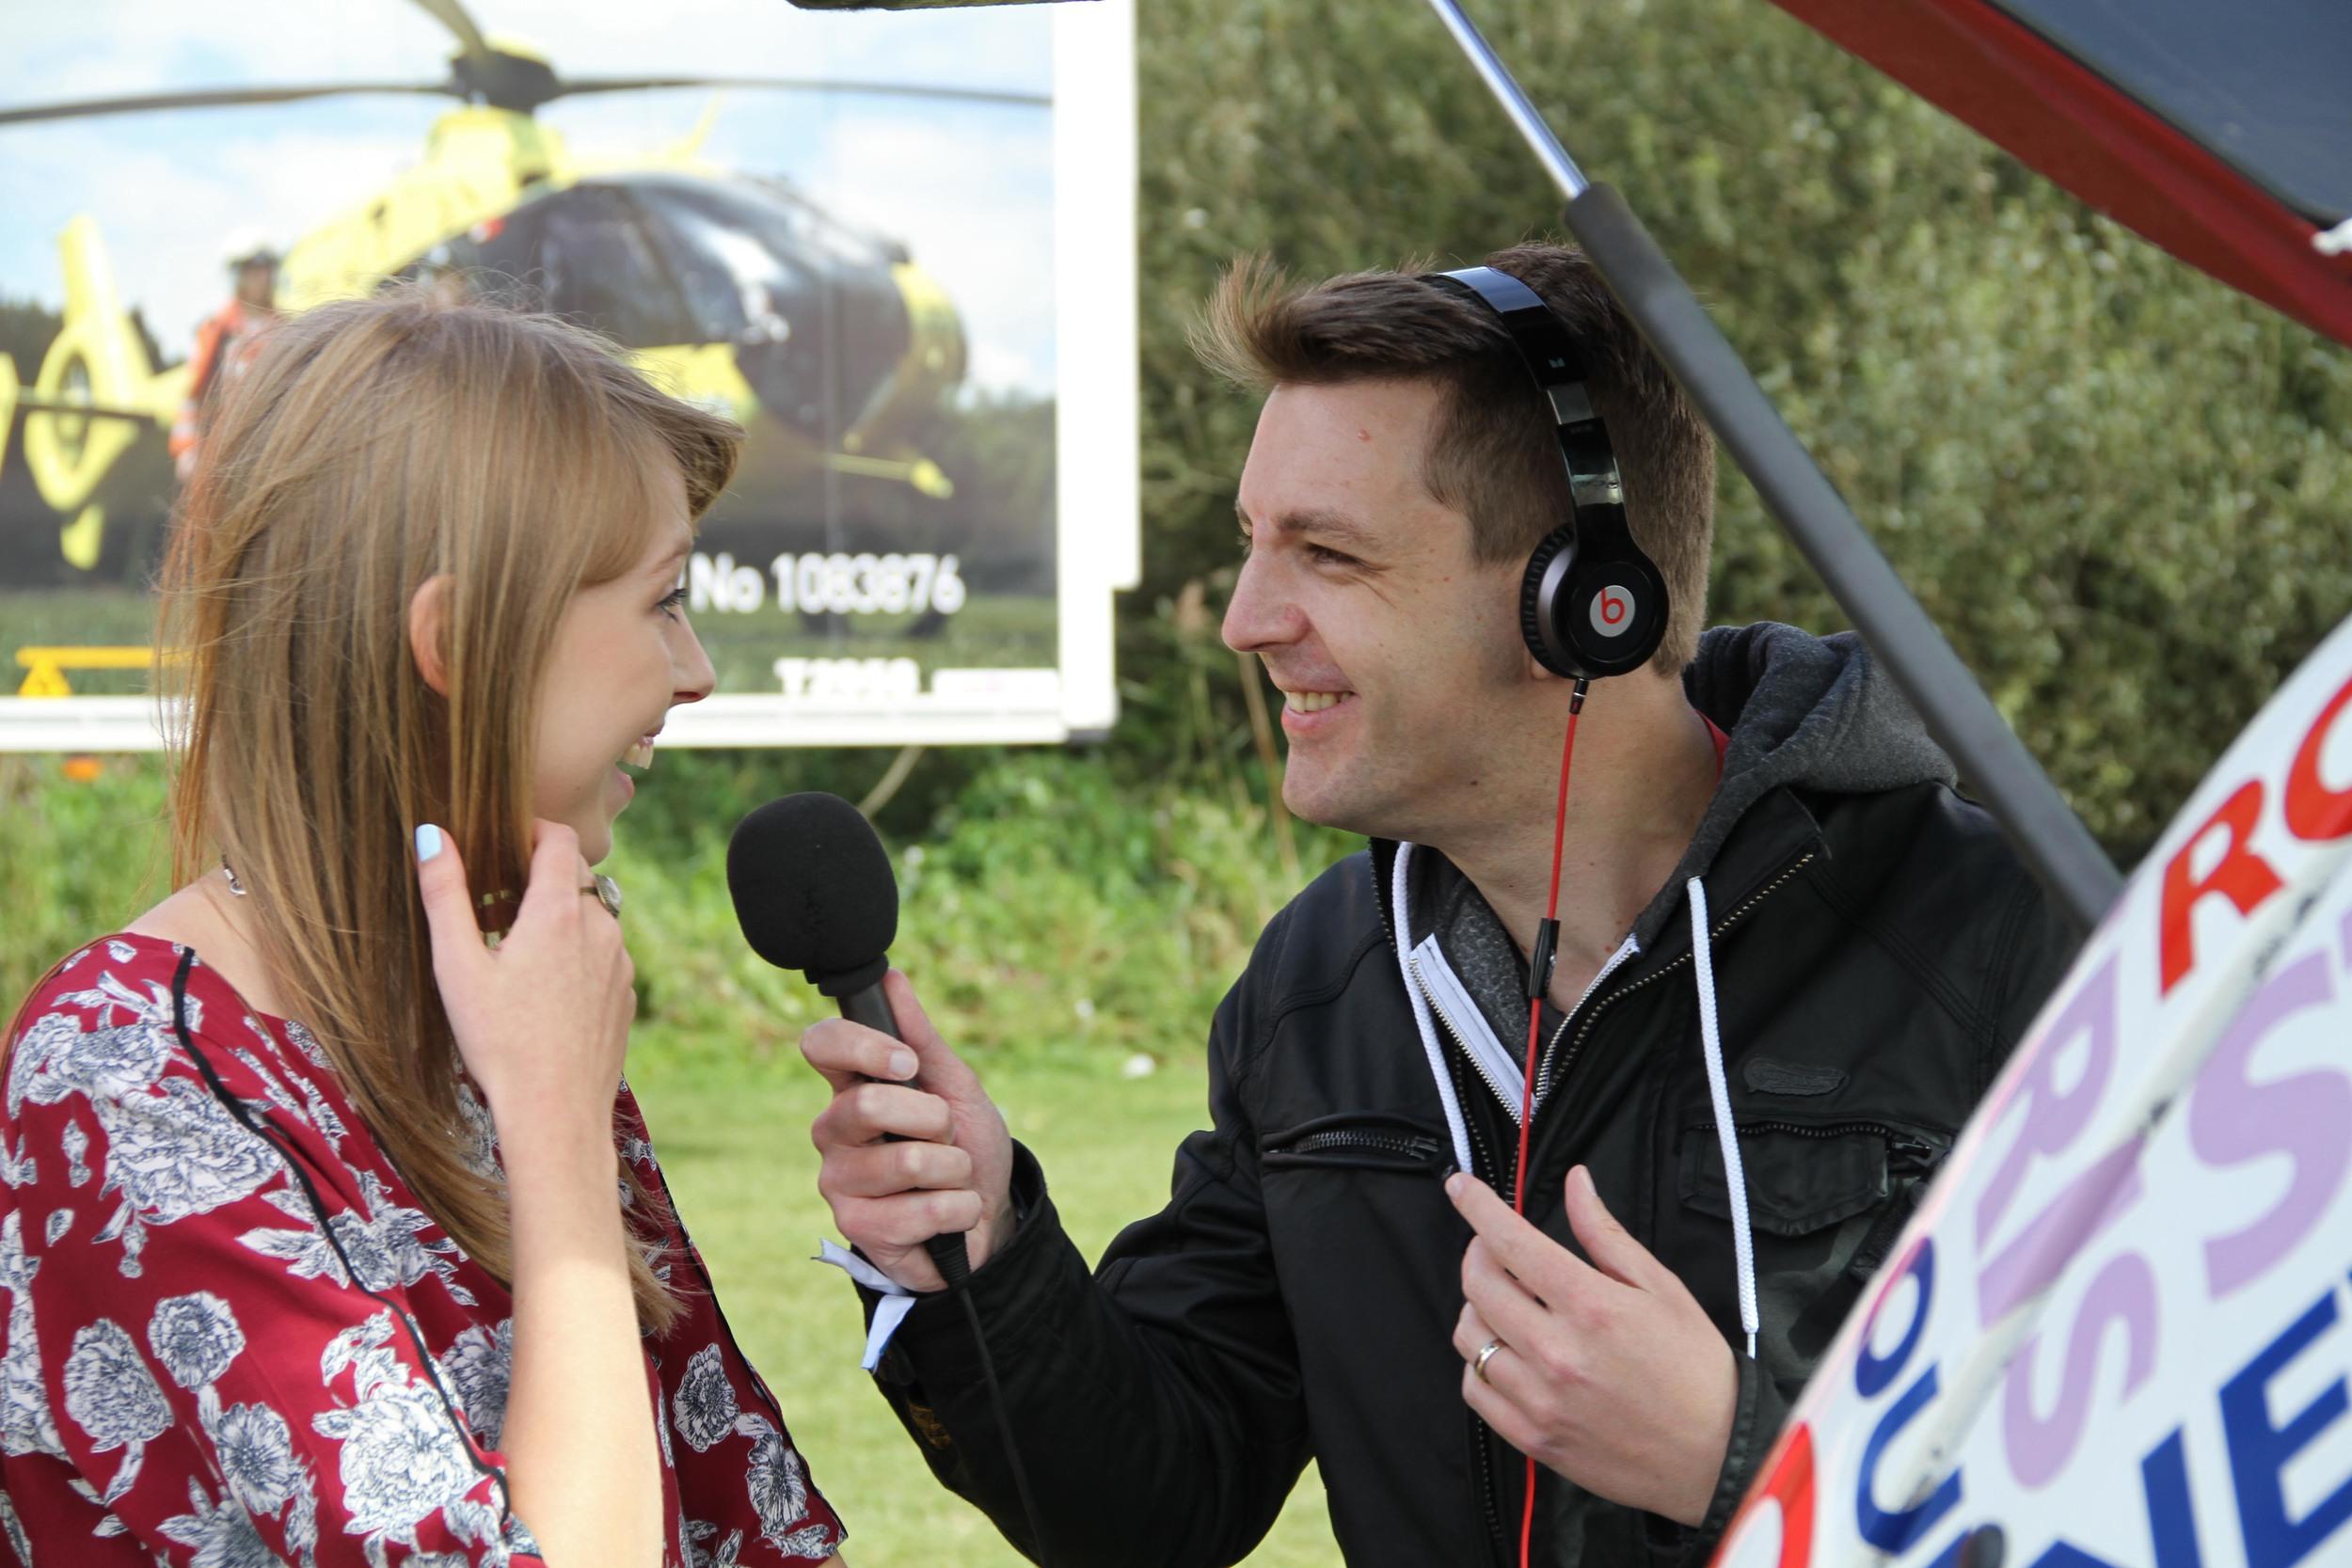 Rachel Clark - BBC Radio Cambridgeshire - Nick Carter - LodeStar 2014 - 3.JPG